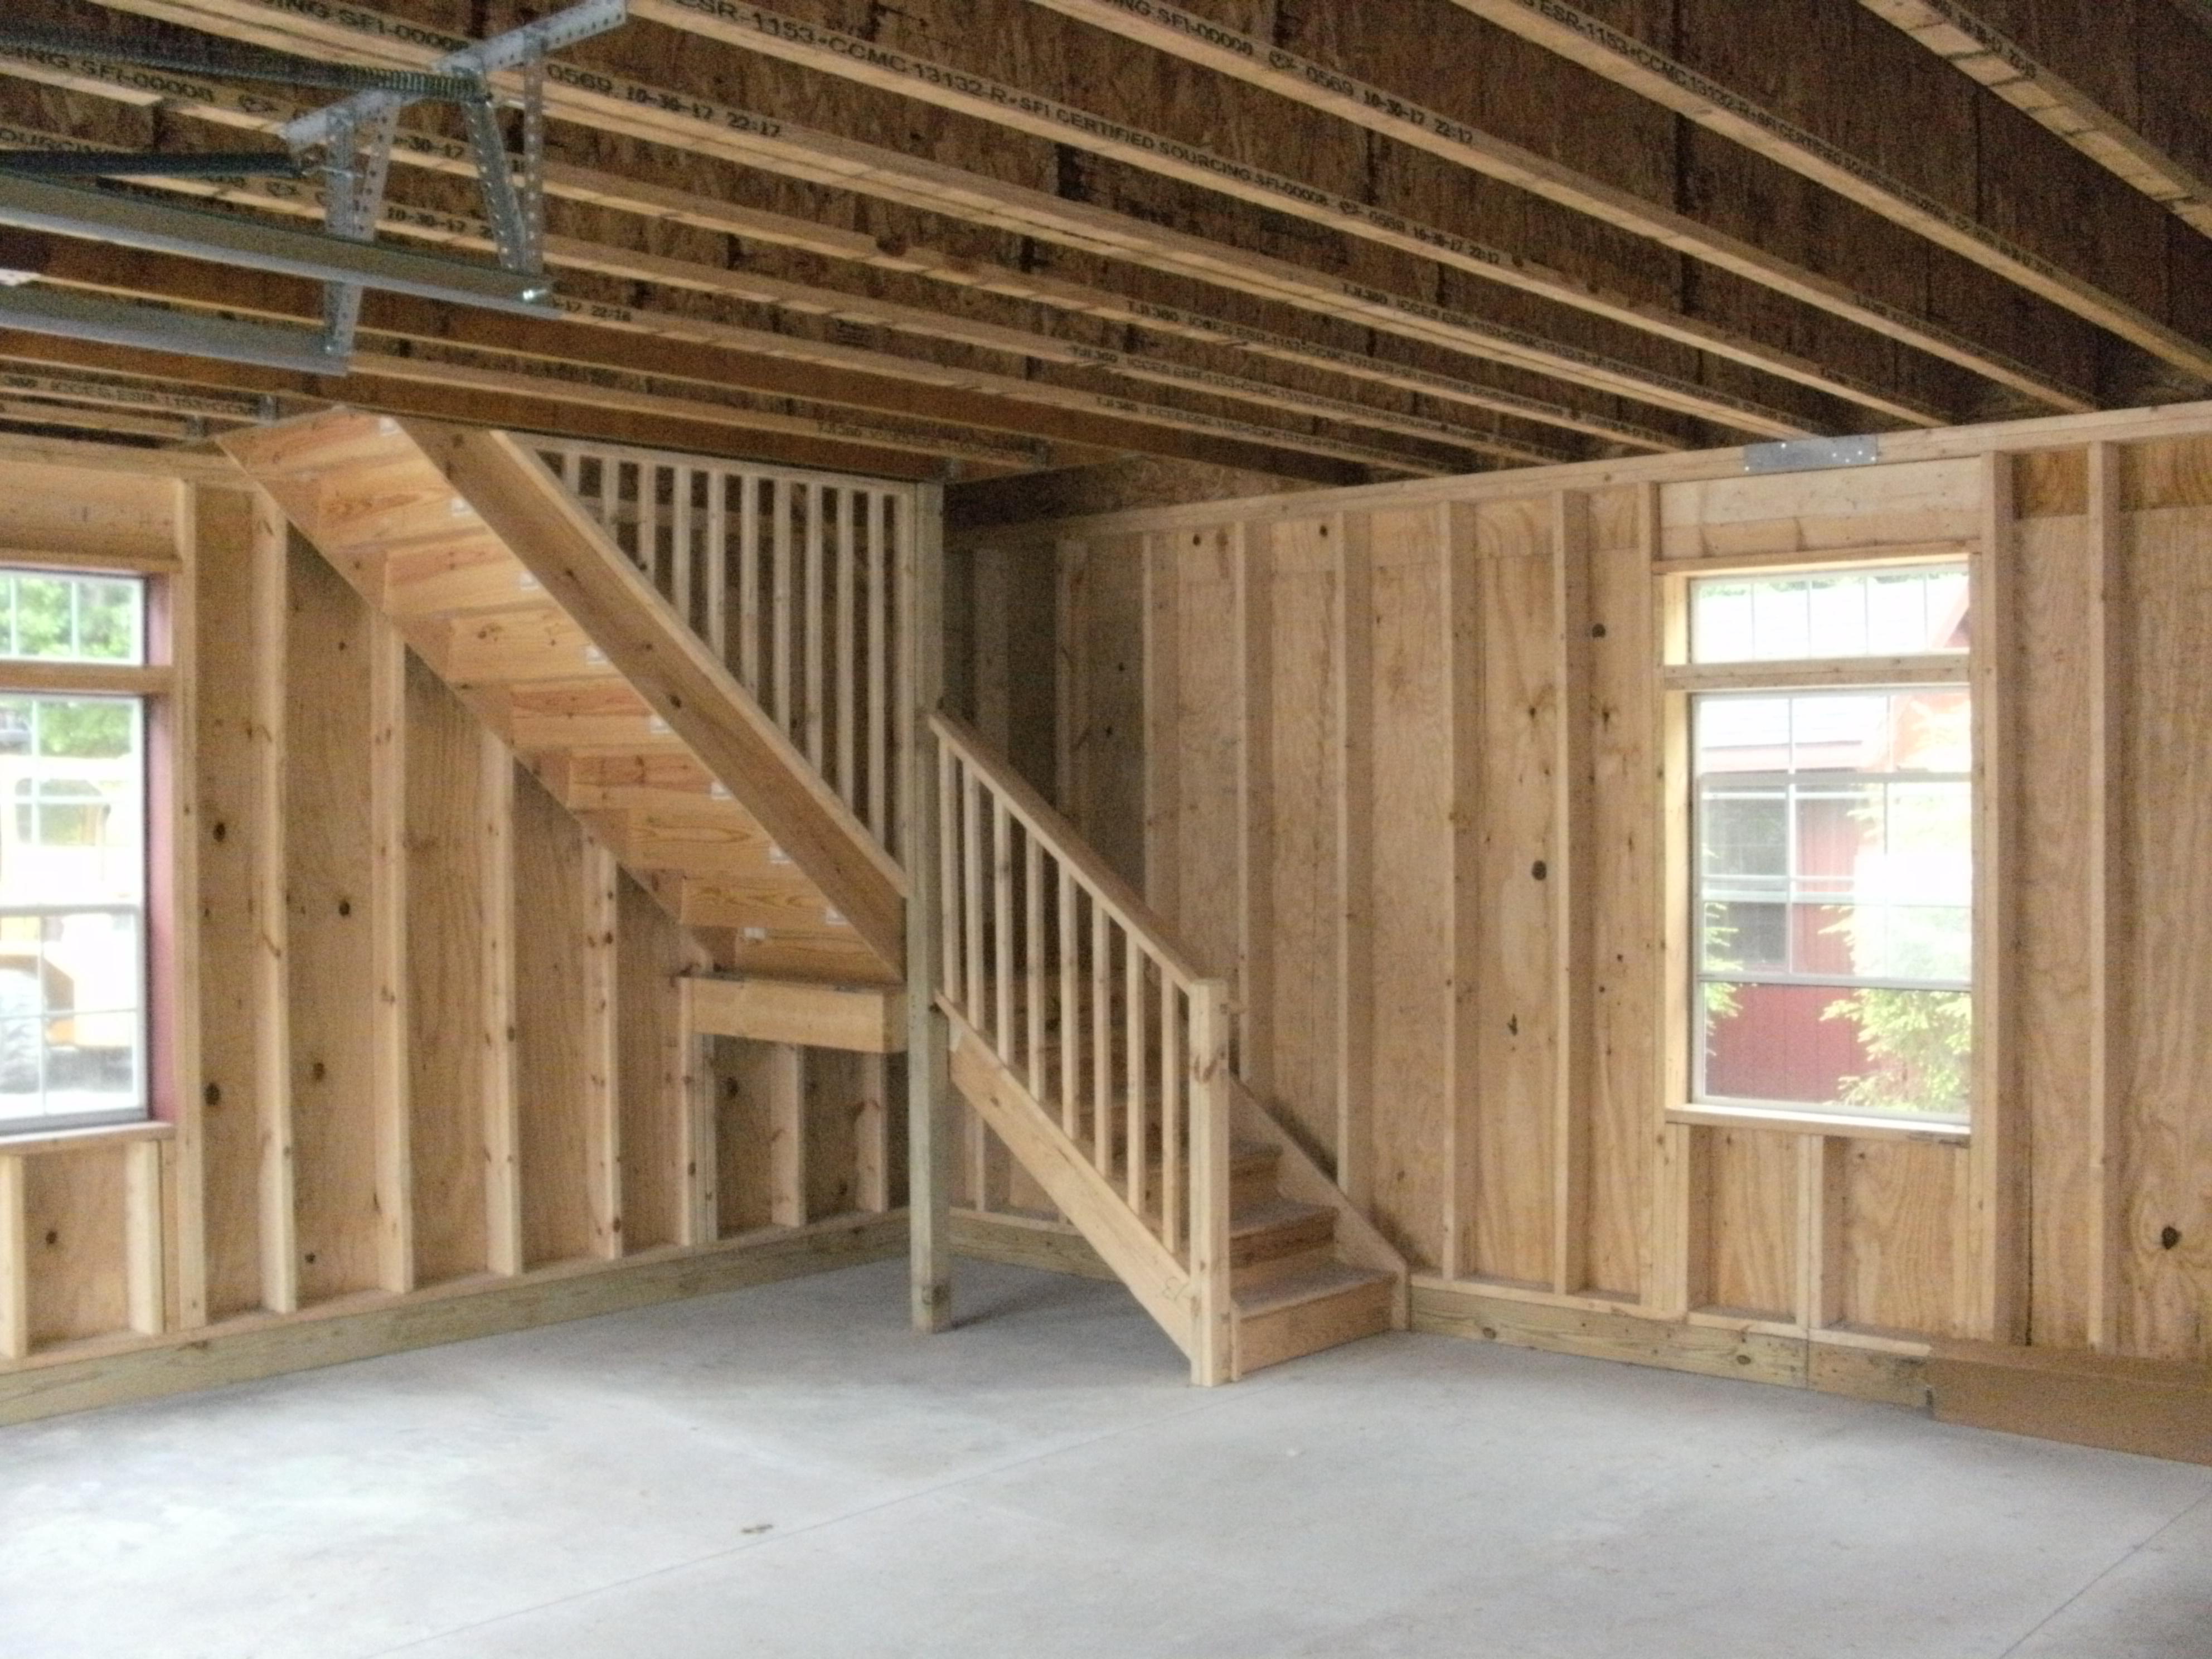 24' X 24' Lp Smartside Garage : Image 3